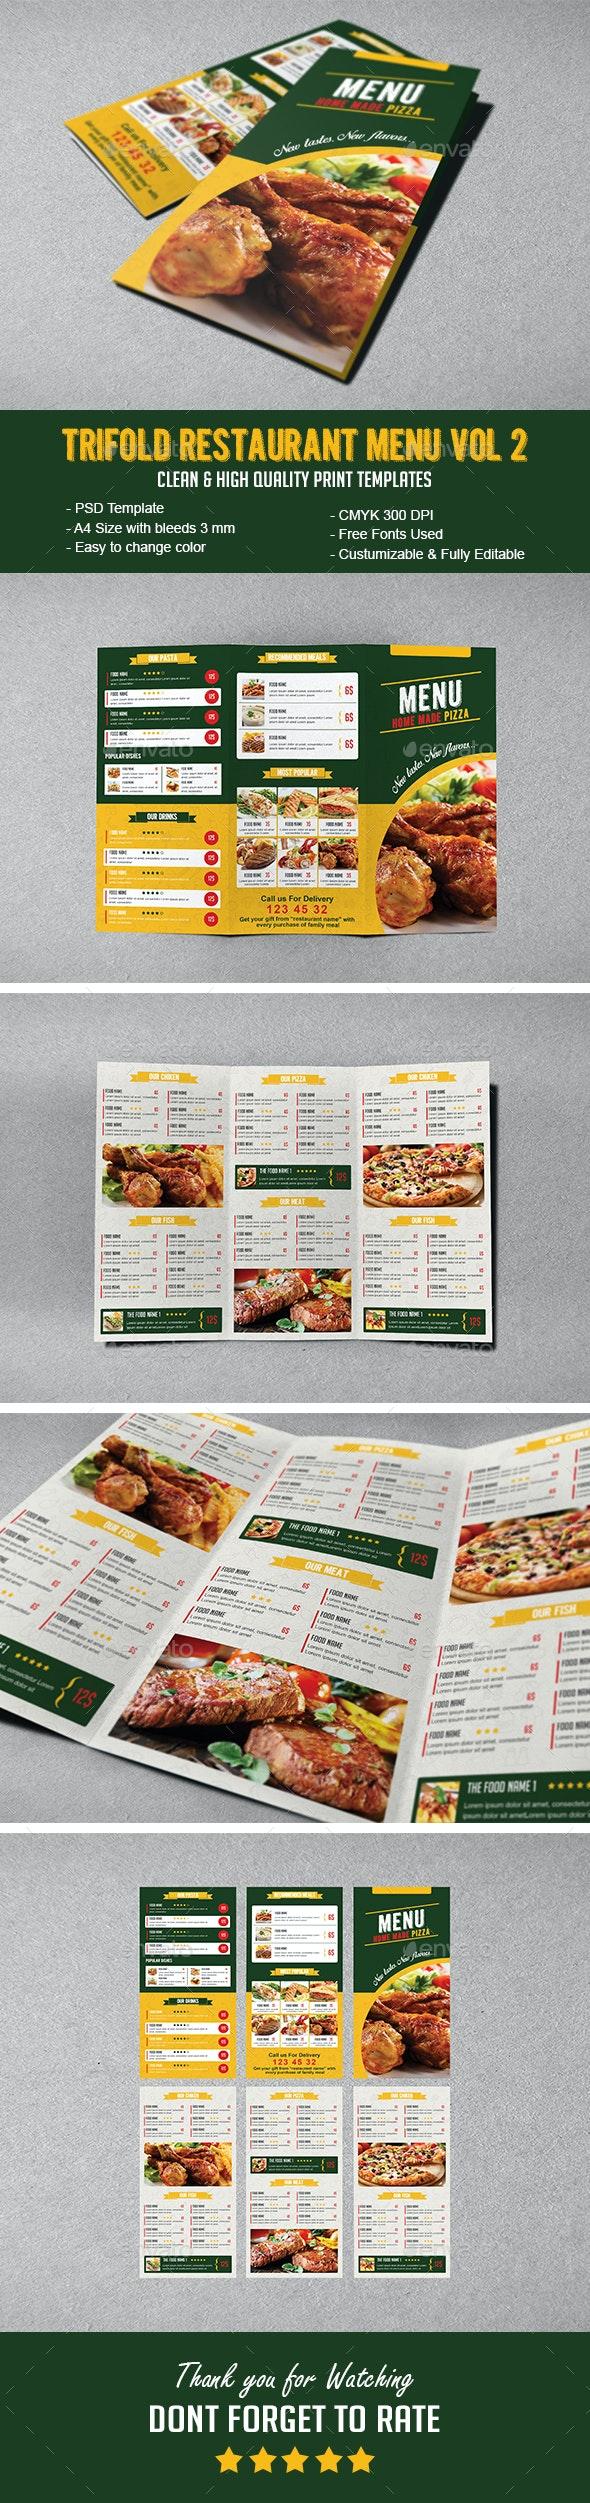 Tri-fold Restaurant Menu Vol 2 - Food Menus Print Templates